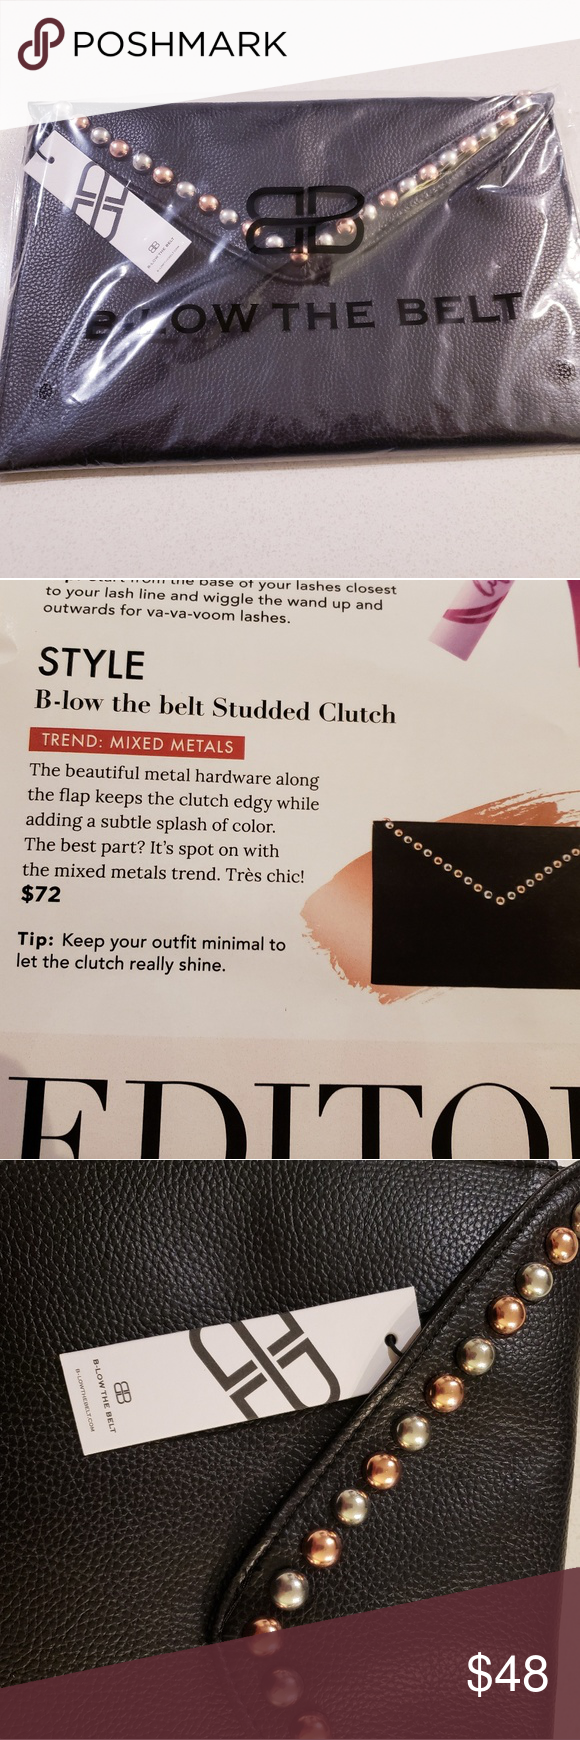 Stunning Below The Belt Studded Clutch Beautiful Black